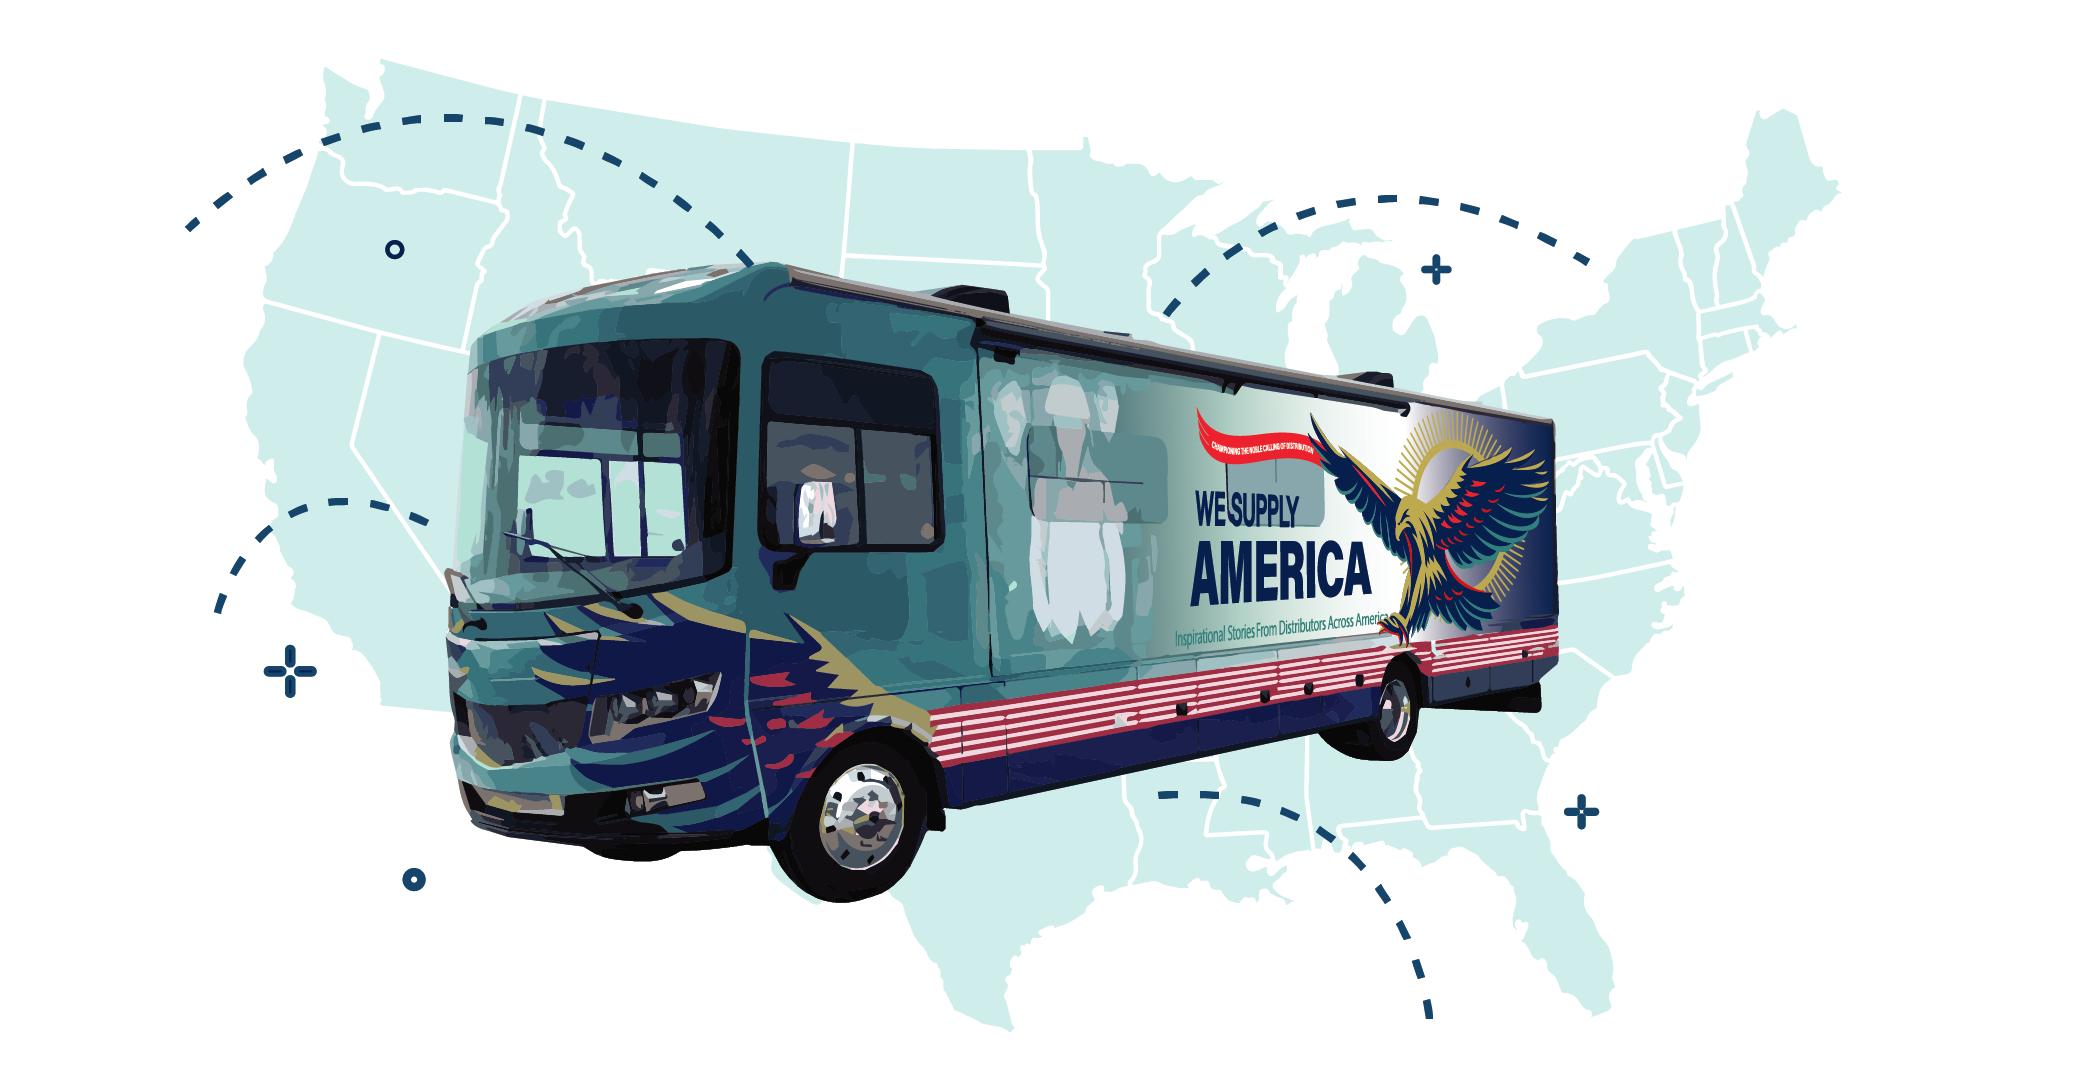 We Supply America RV